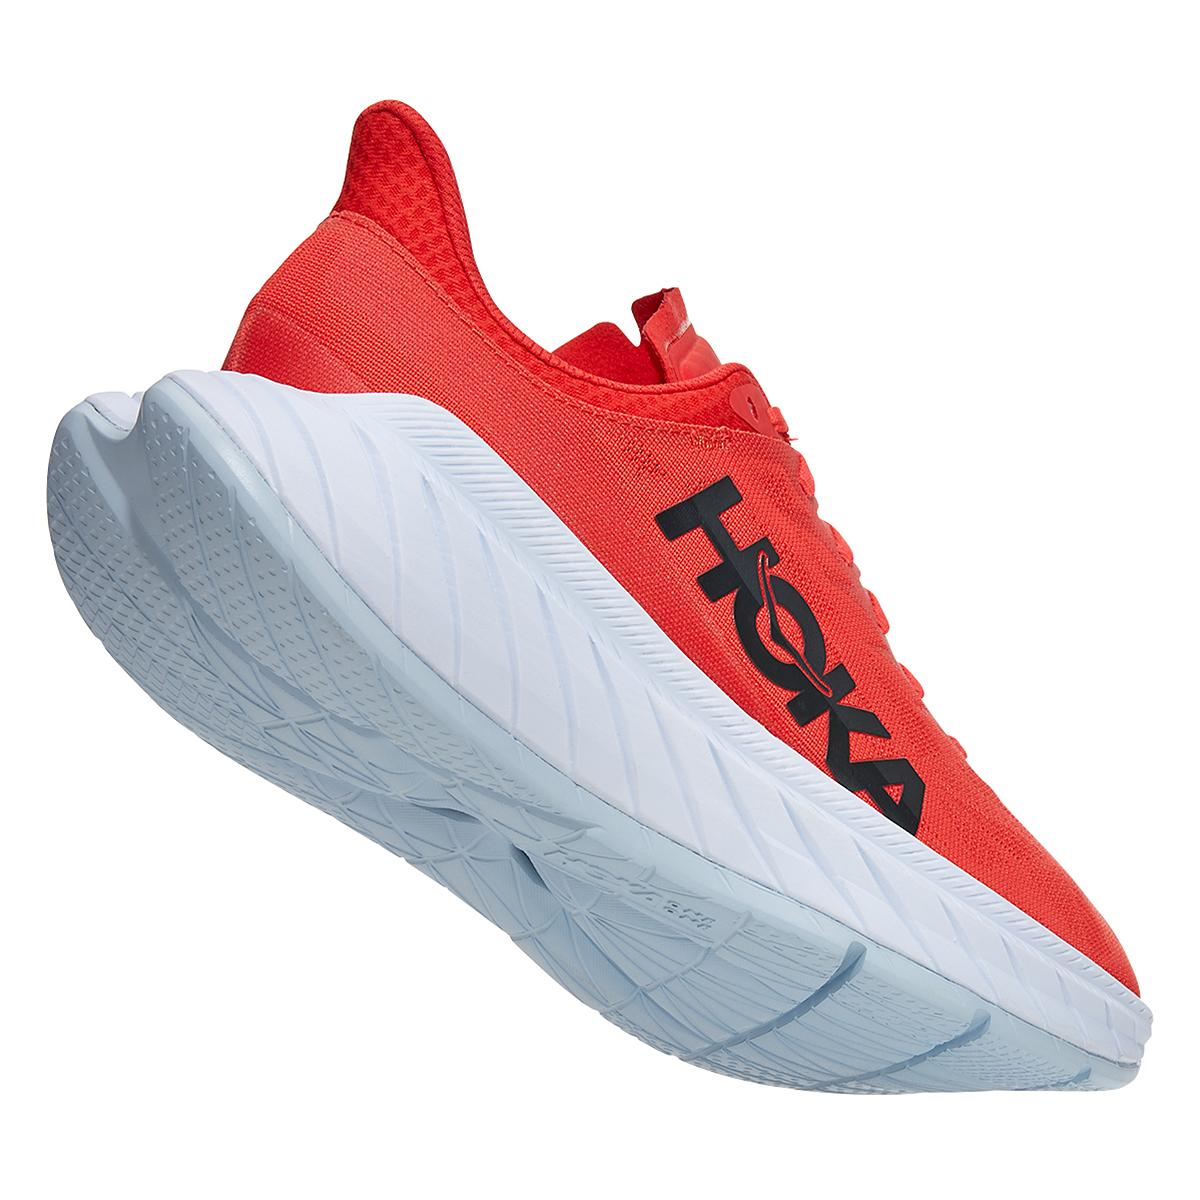 Men's Hoka One One Carbon X 2 Running Shoe - Color: Fiesta/White - Size: 9 - Width: Regular, Fiesta/White, large, image 4